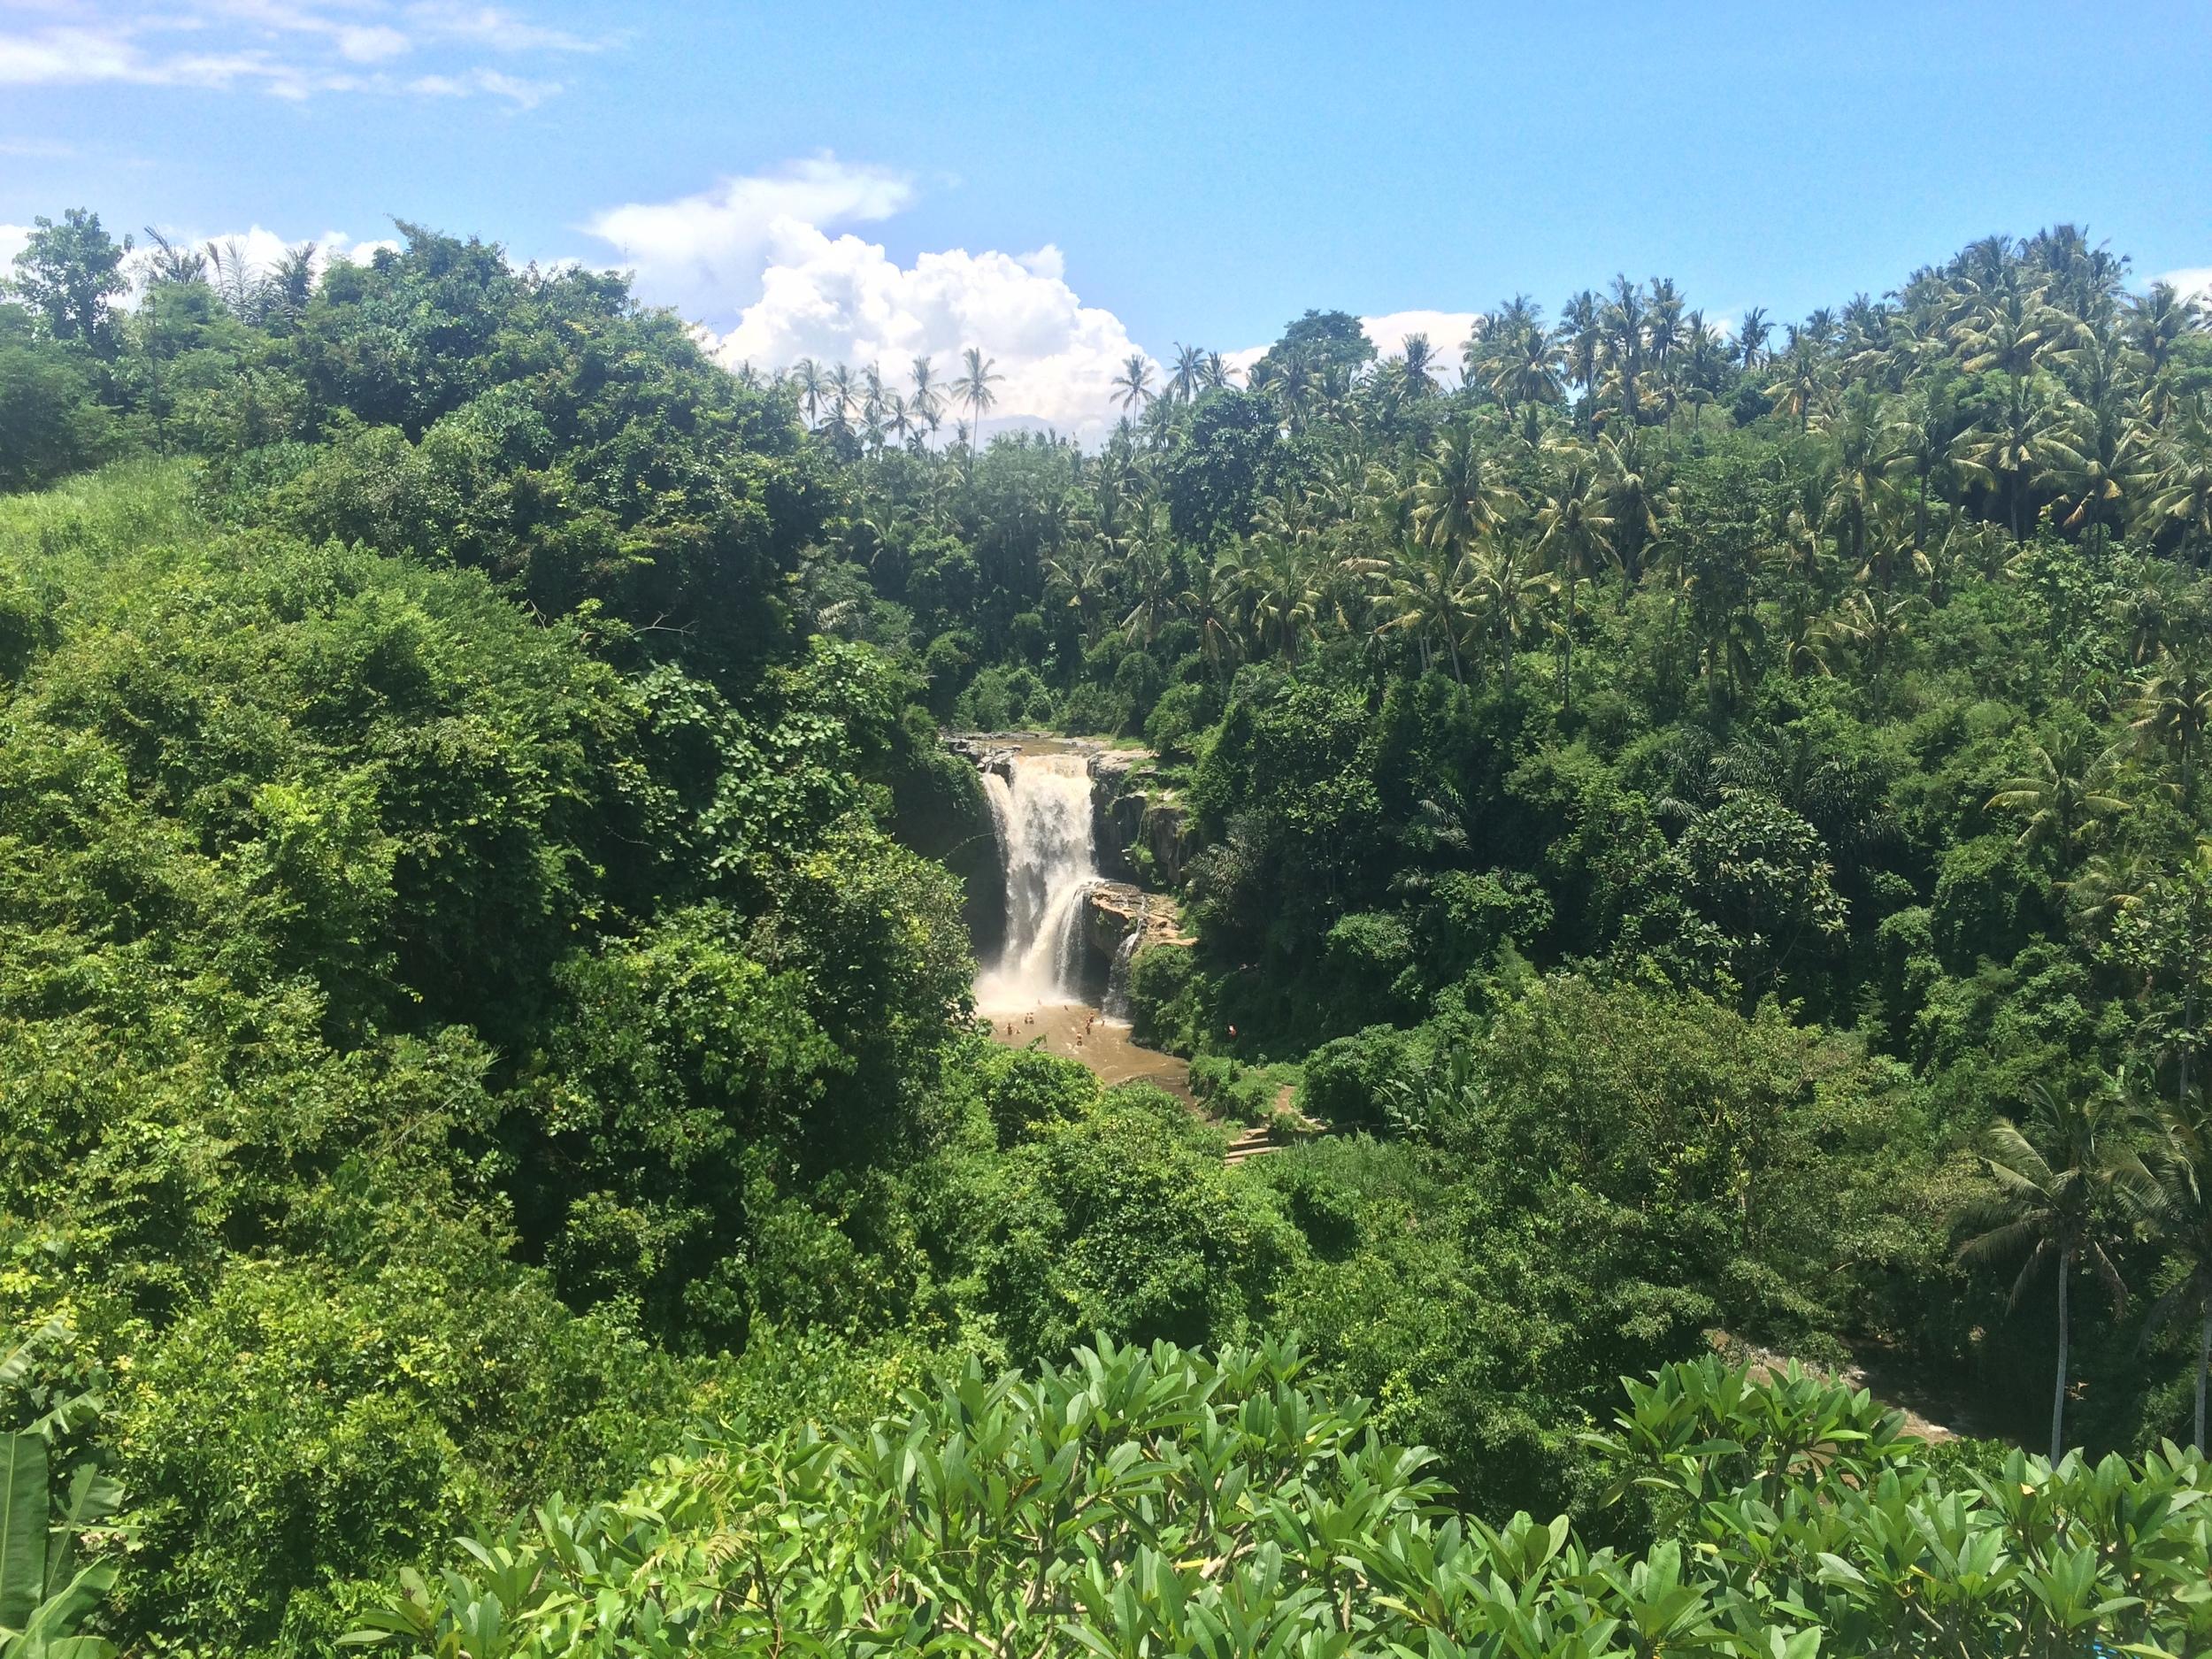 Looking down on the popular Tegenungan waterfall